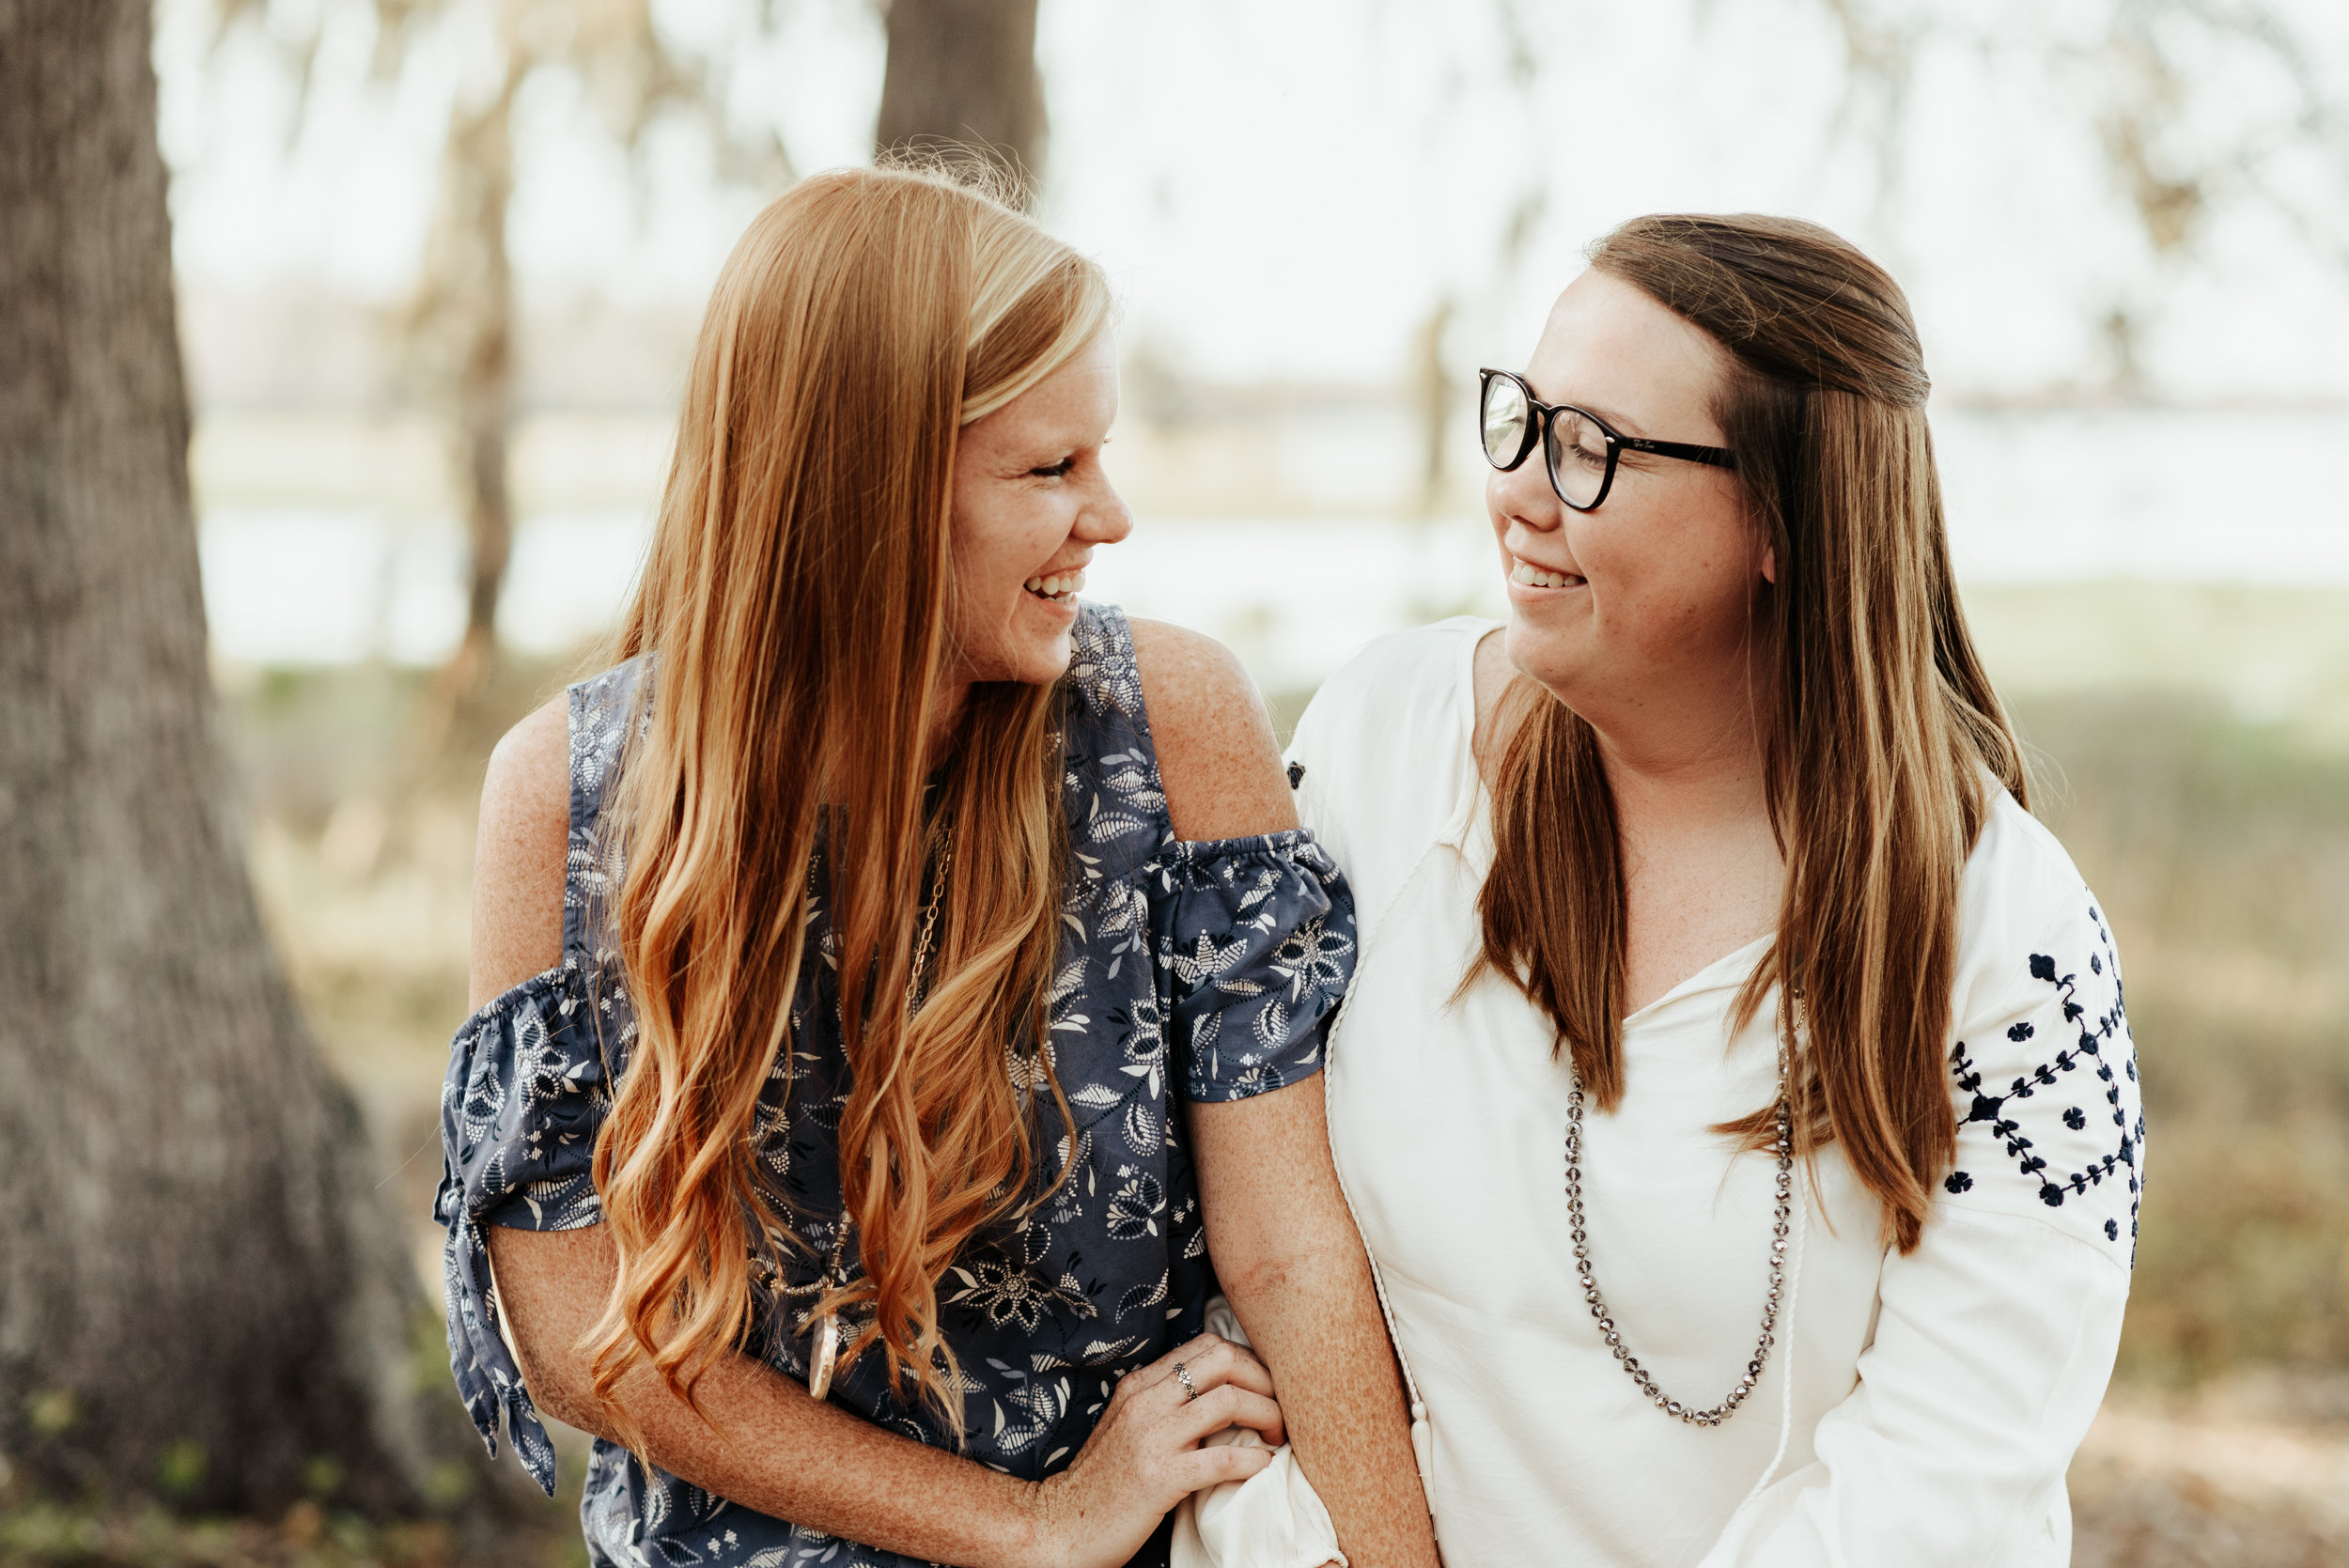 Brooke-April-Engagement-0009.jpg